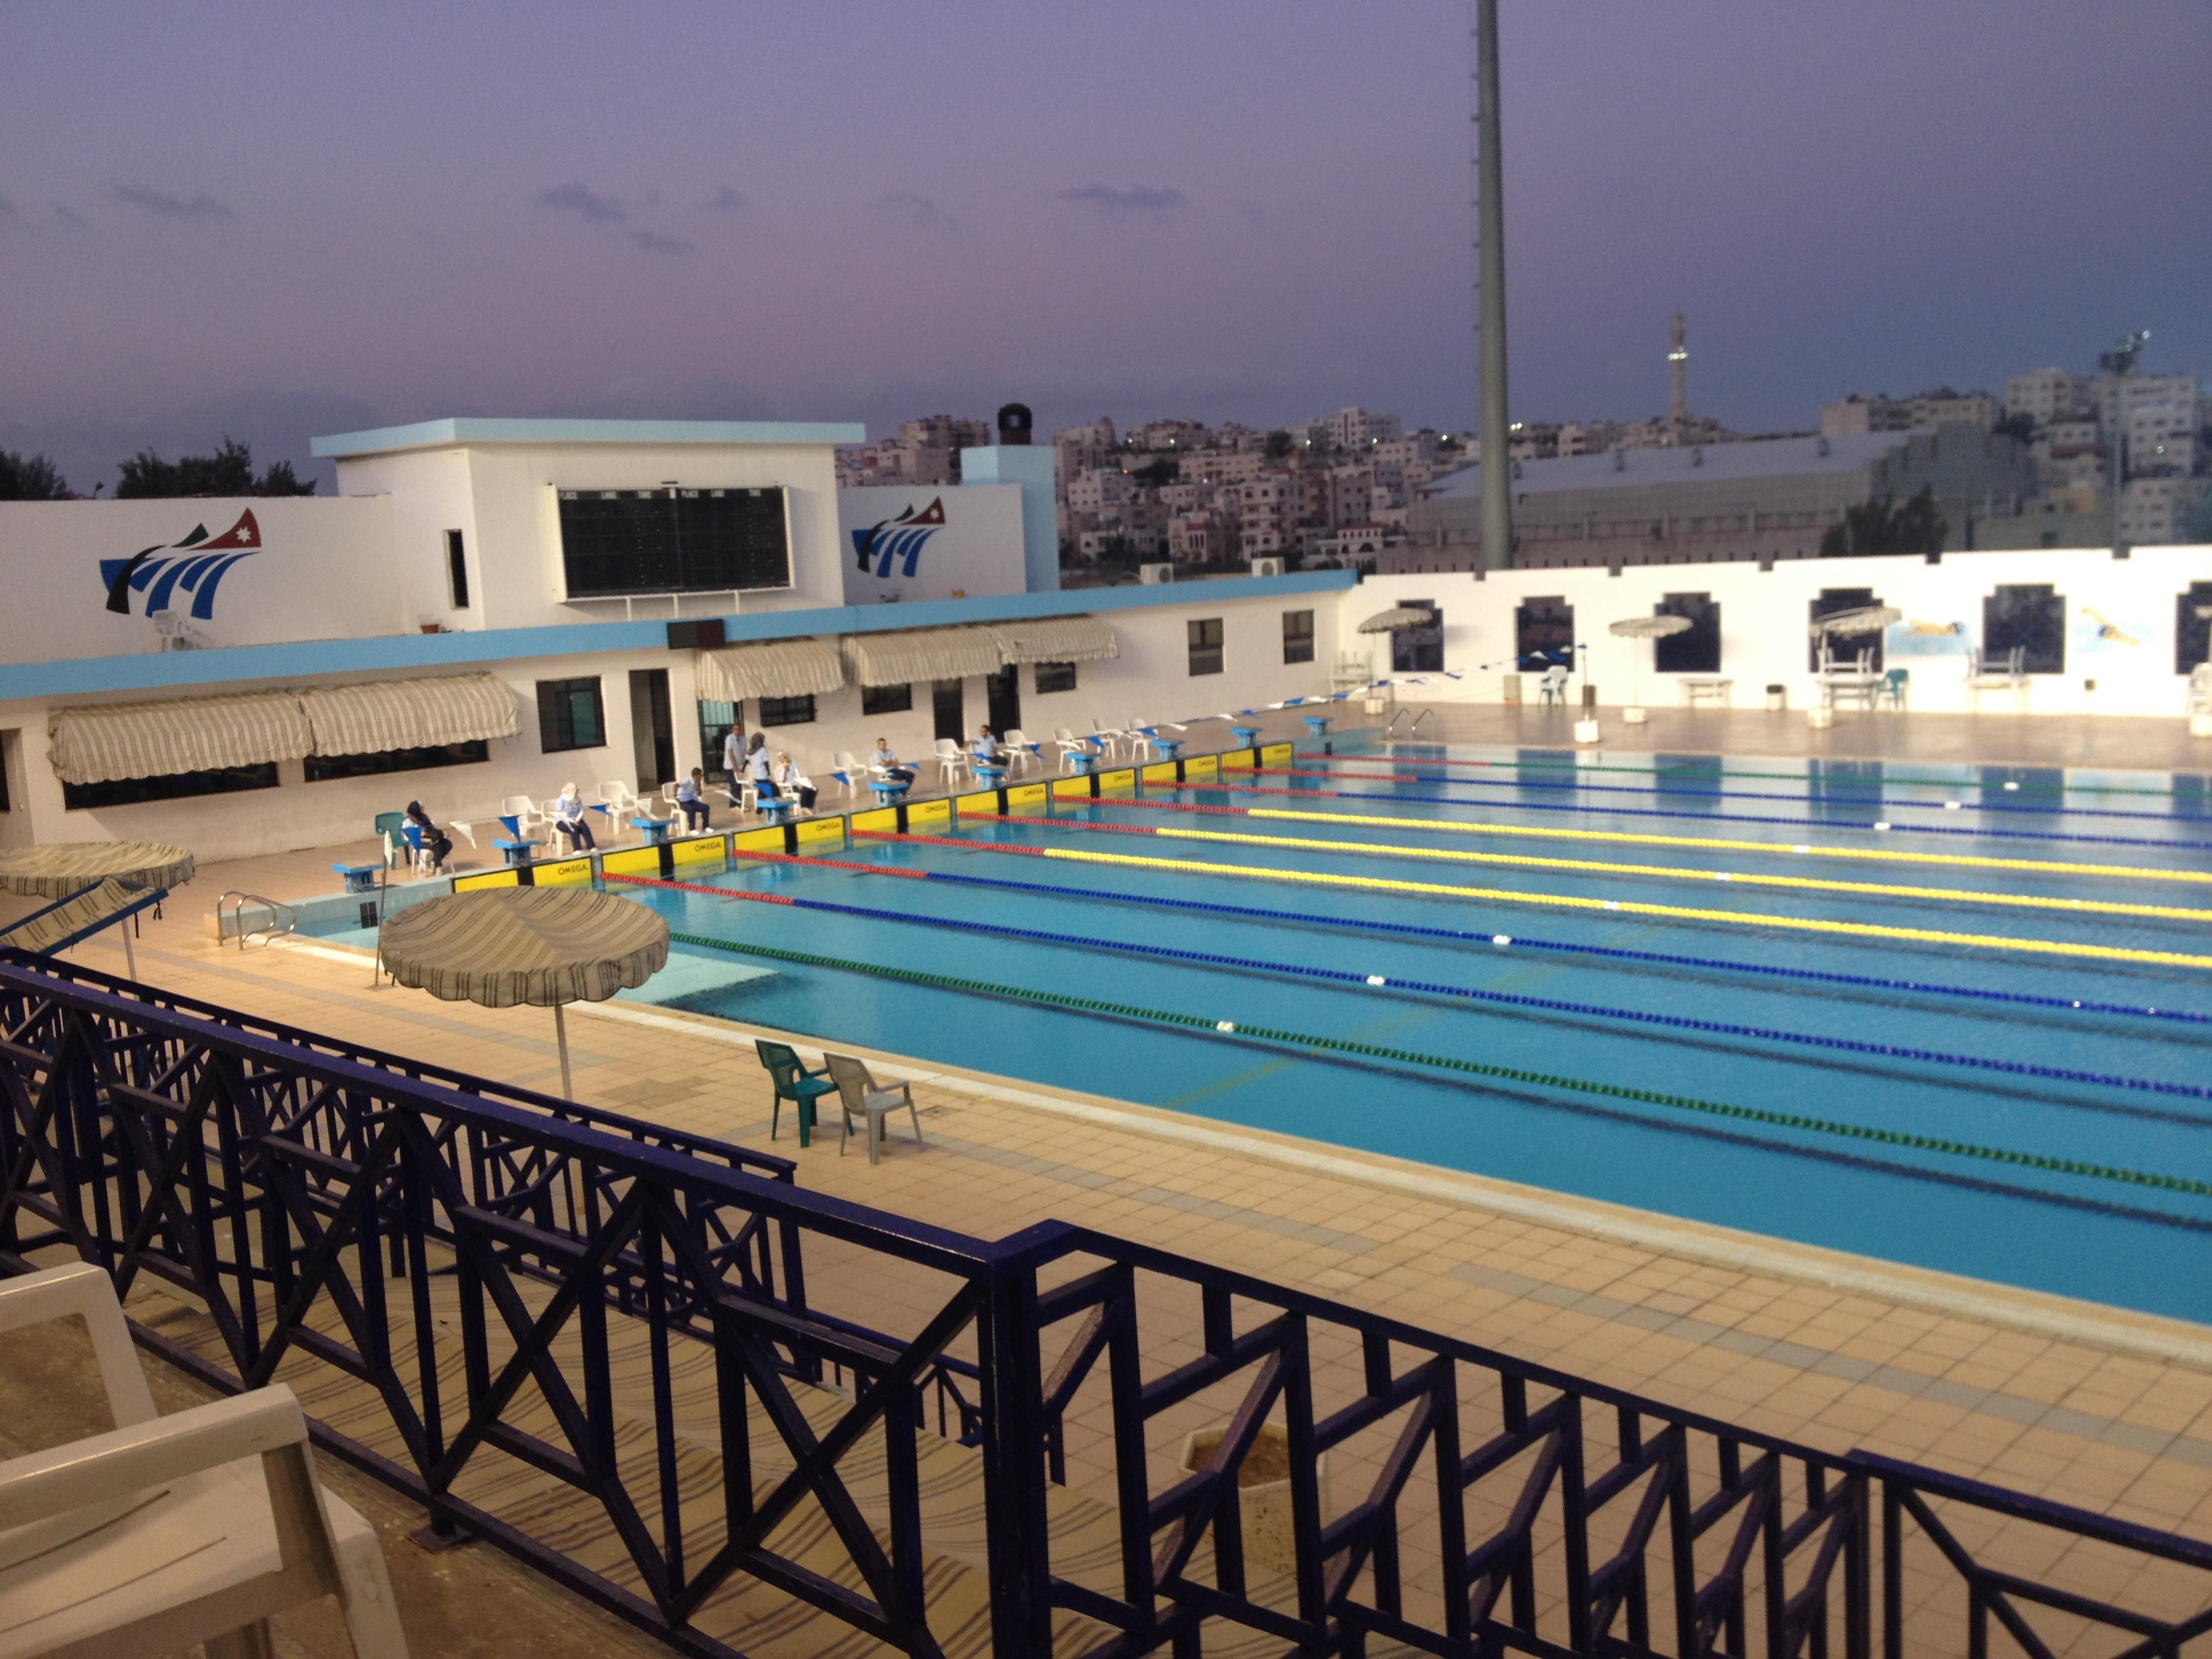 Ordinaire File:Olympic Swimming Pool, Sport City, Amman 02.JPG